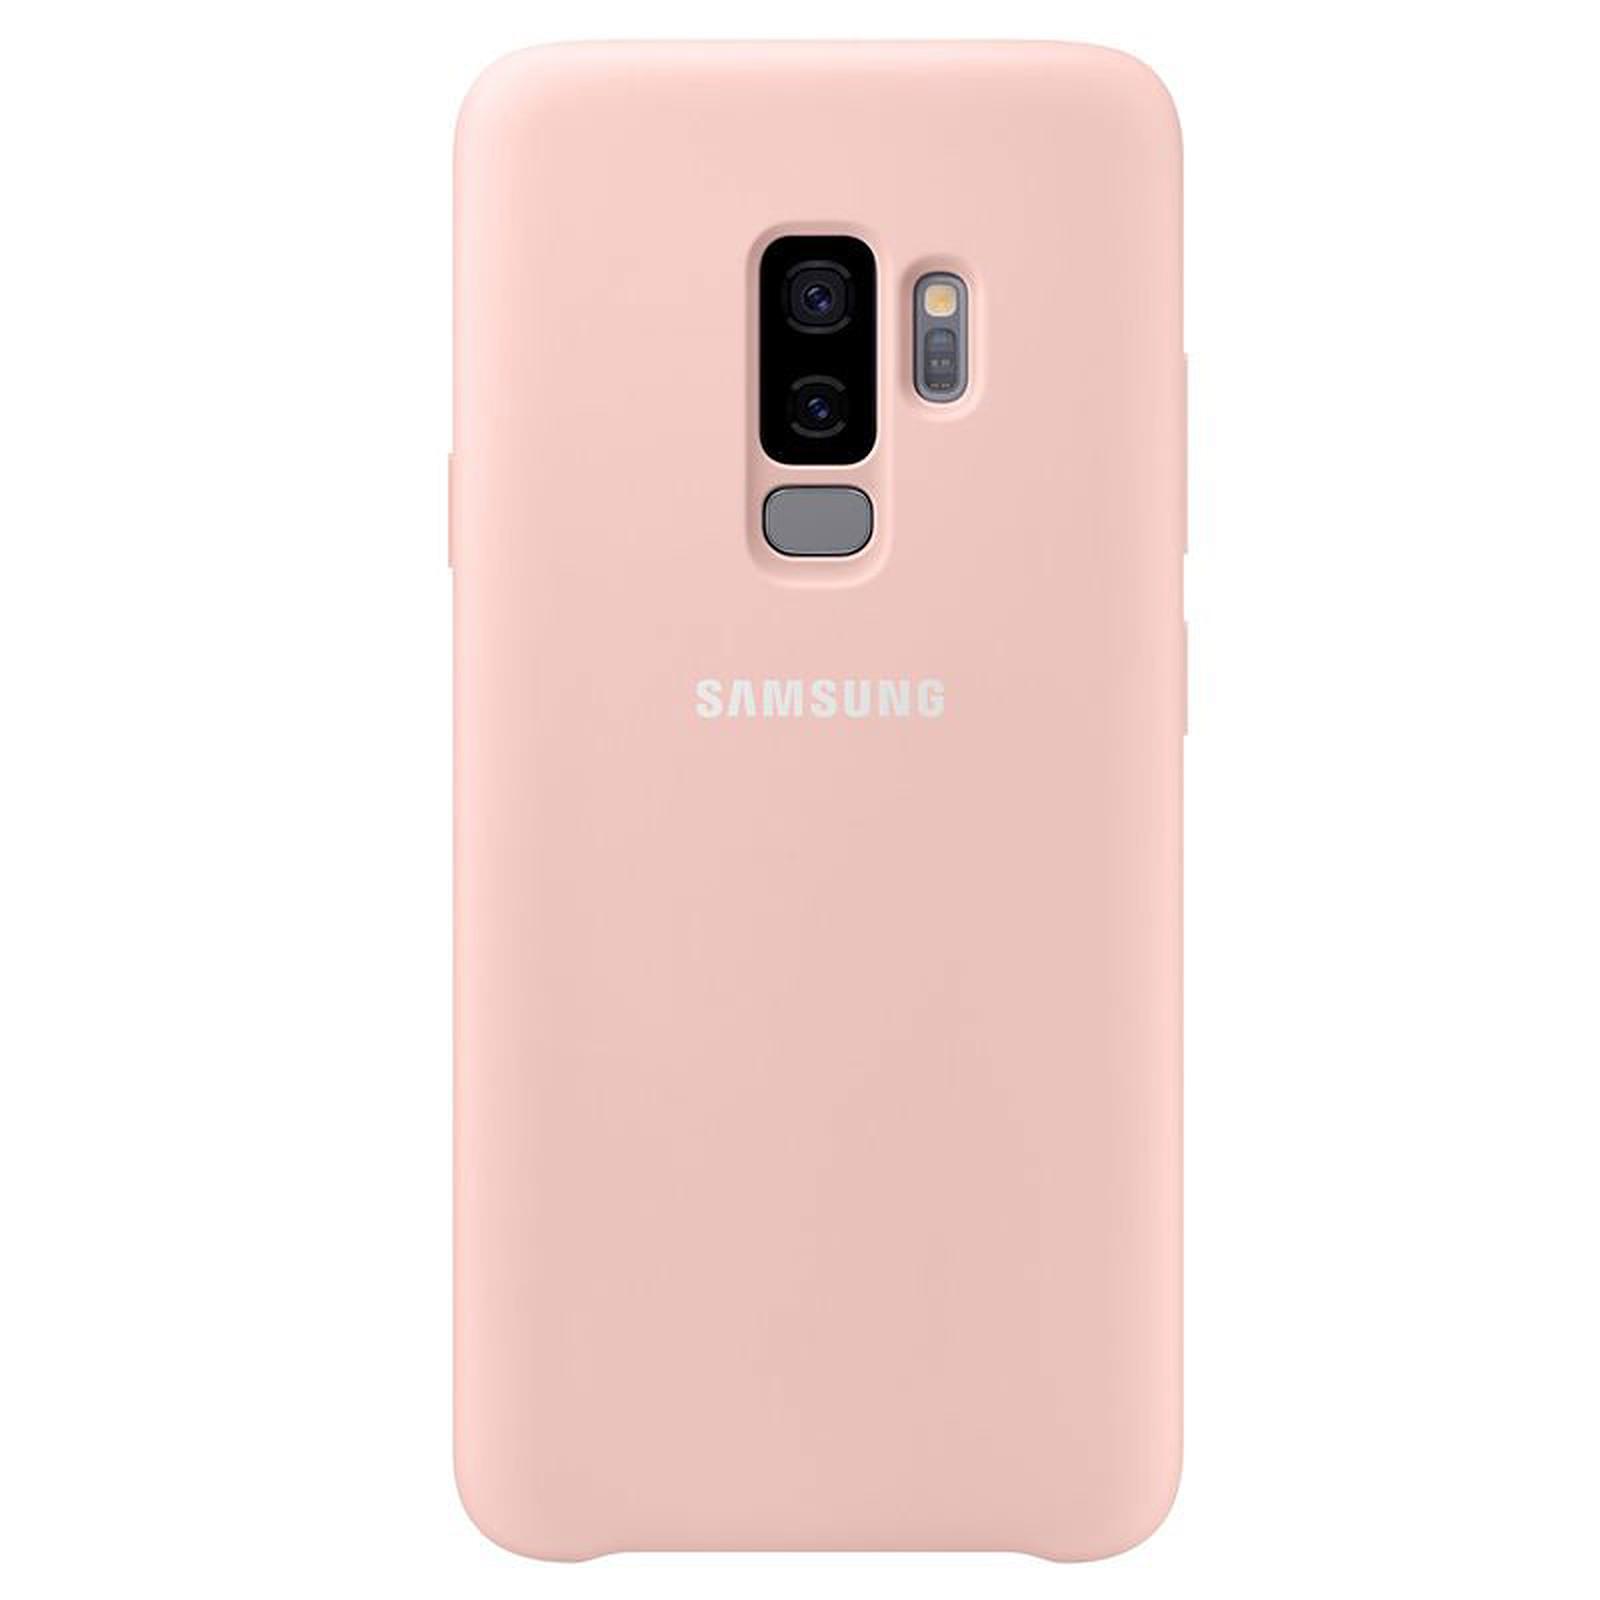 Samsung Coque Silicone Rose Galaxy S9+